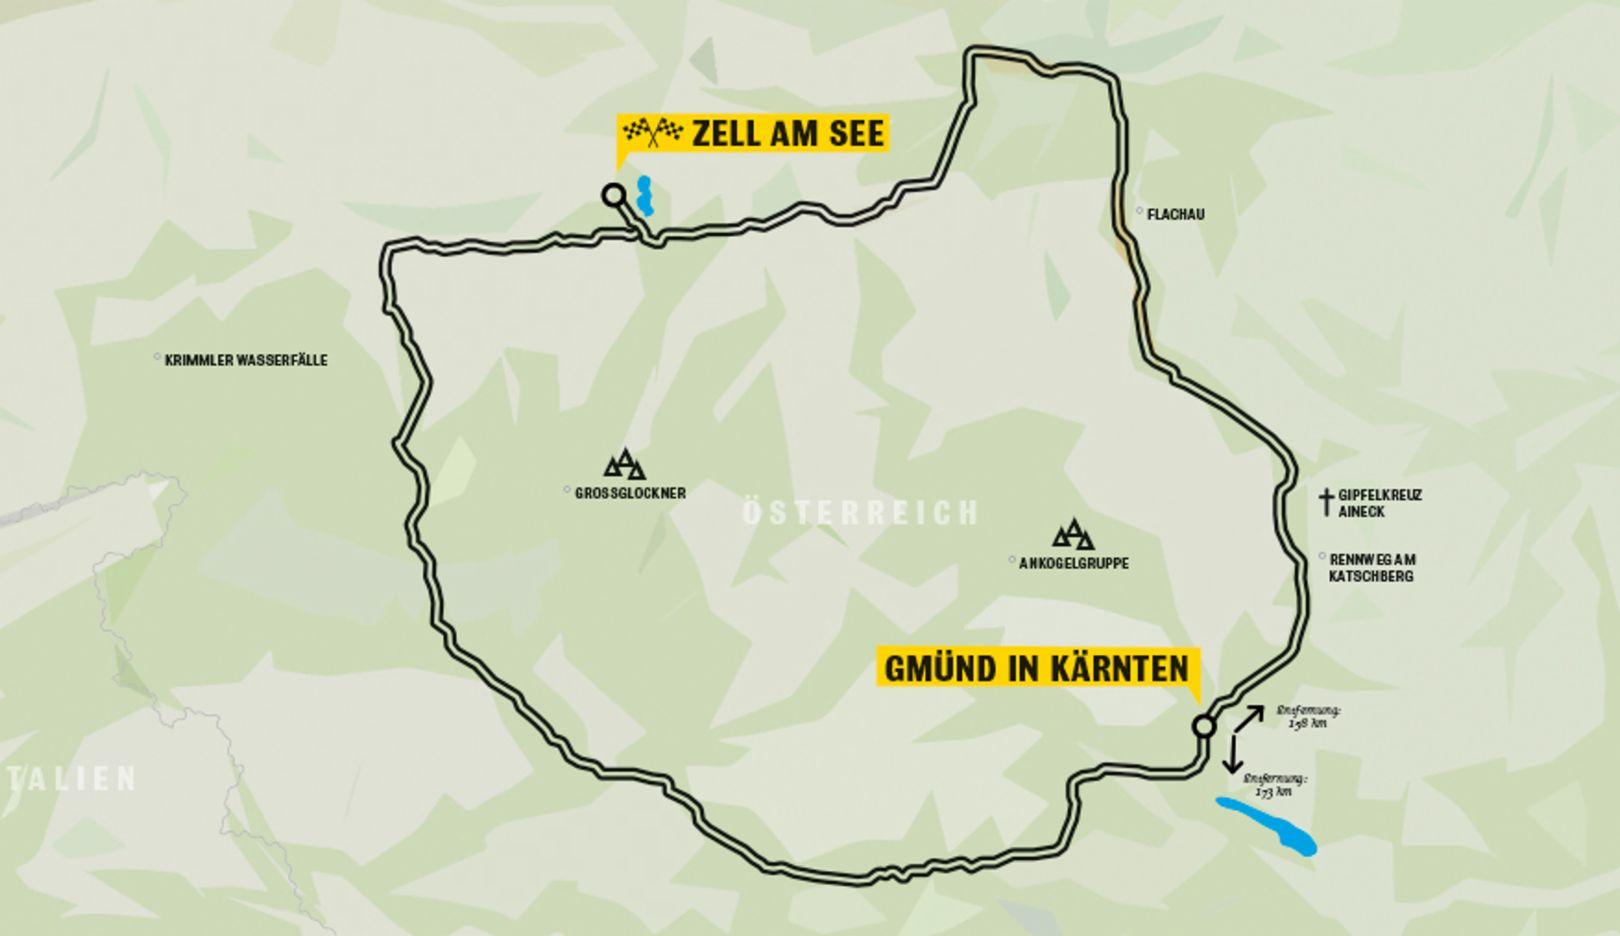 Strecke, Porsche Werk Gmünd, Zell am See, Porsche AG